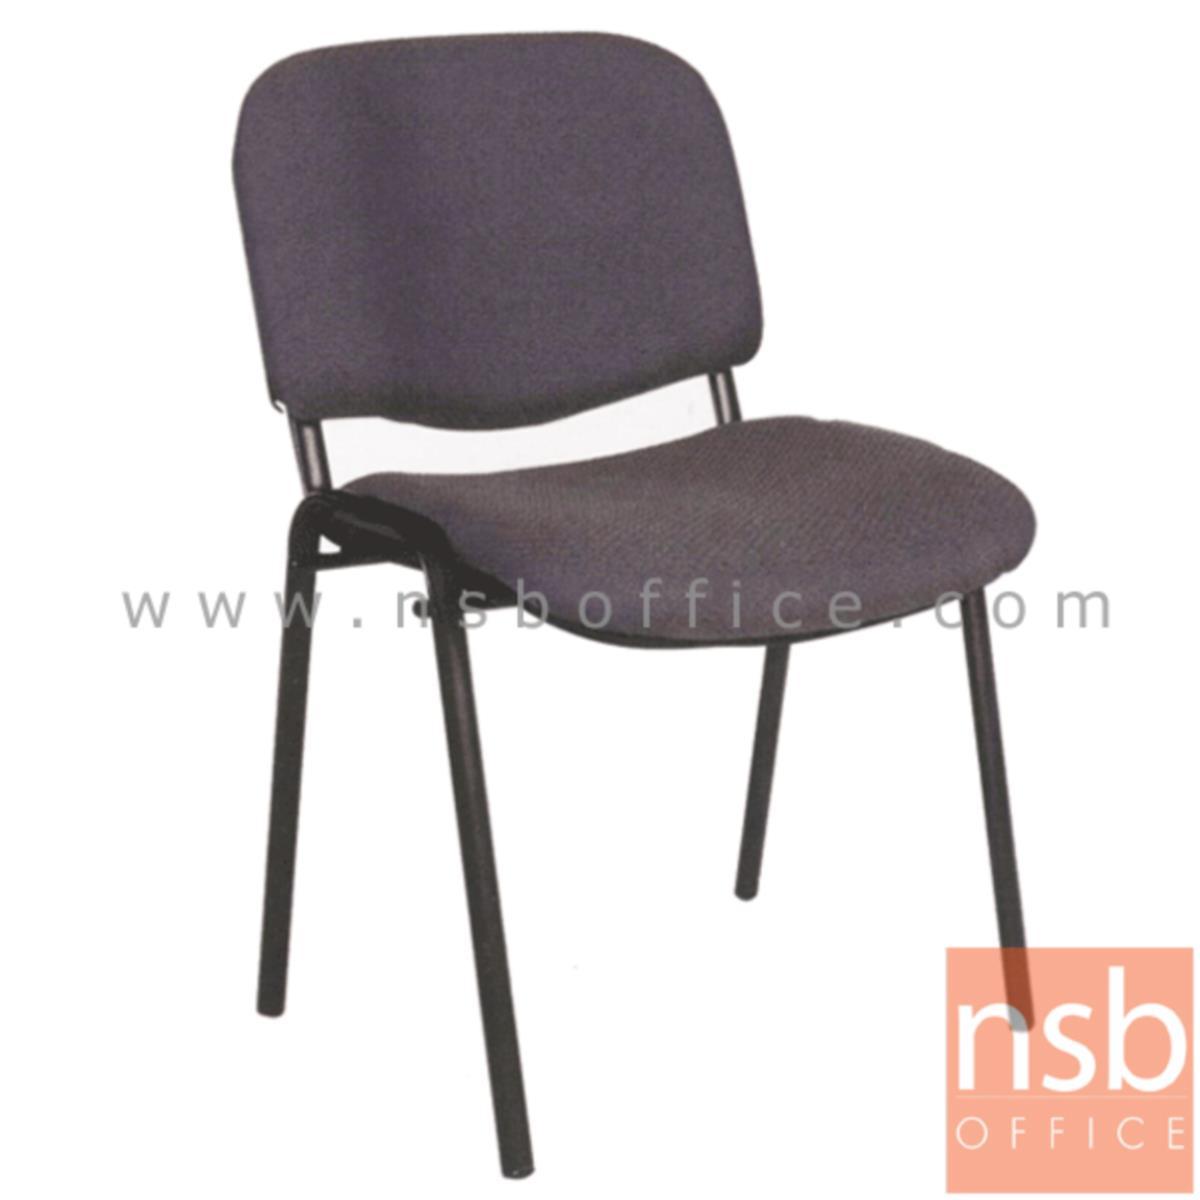 B05A028:เก้าอี้อเนกประสงค์ รุ่น A260  ขาเหล็กพ่นดำ